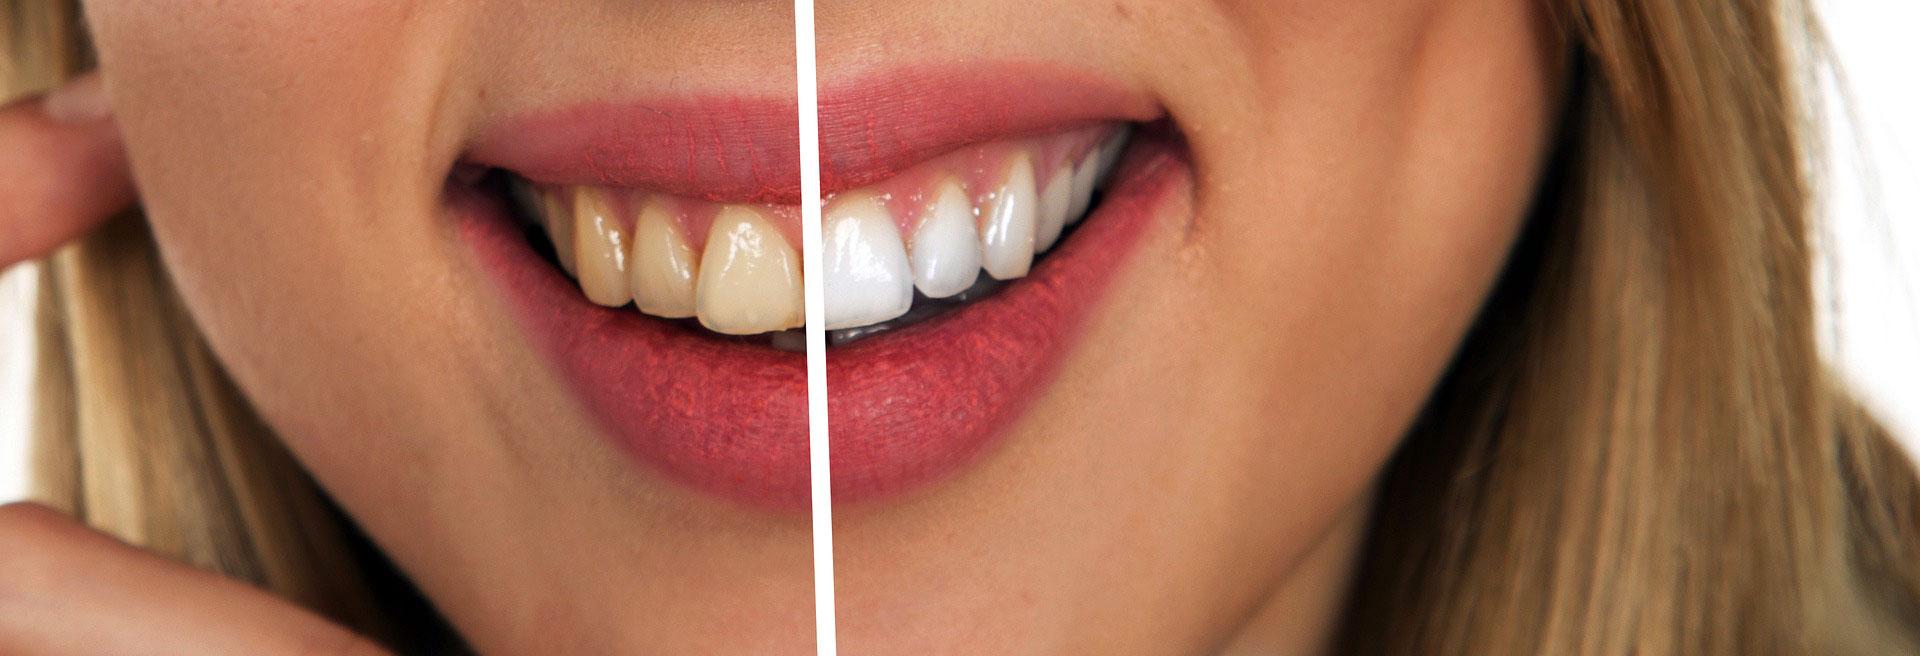 teeth whitening dentist, teeth whitening cambridge, best teeth whitening method, regent dental teeth whitening